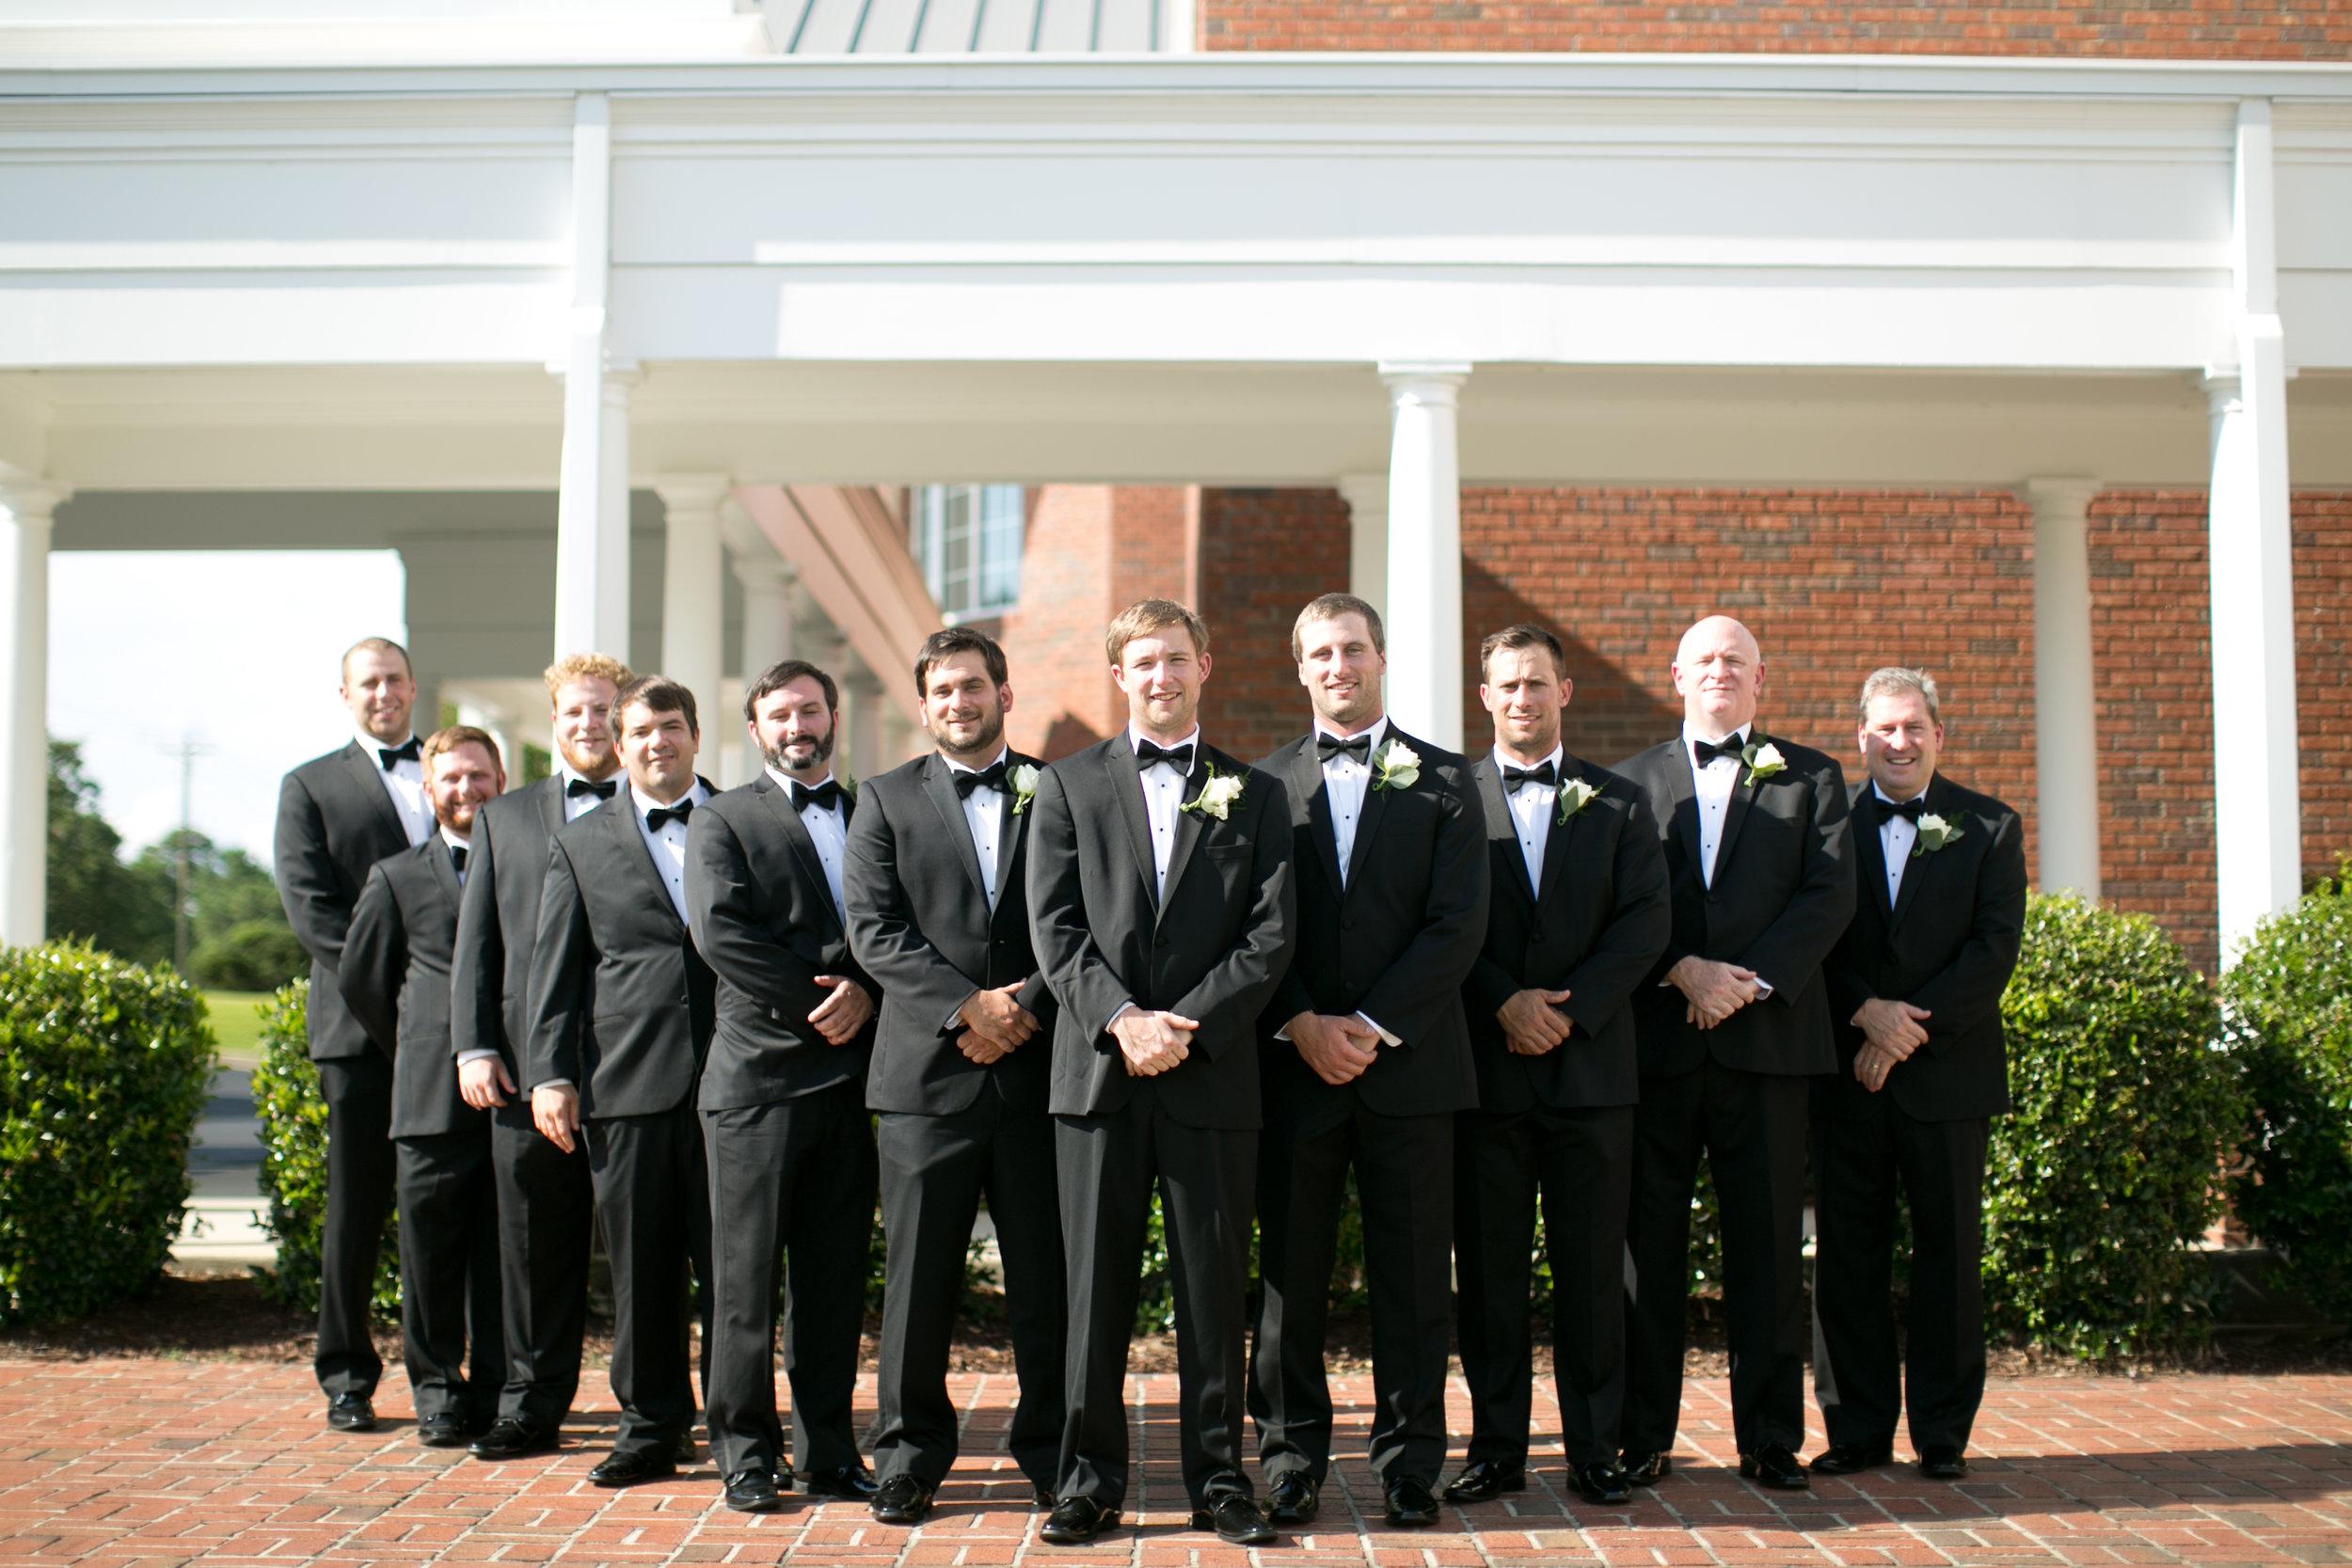 701_whaley_wedding_26.jpg